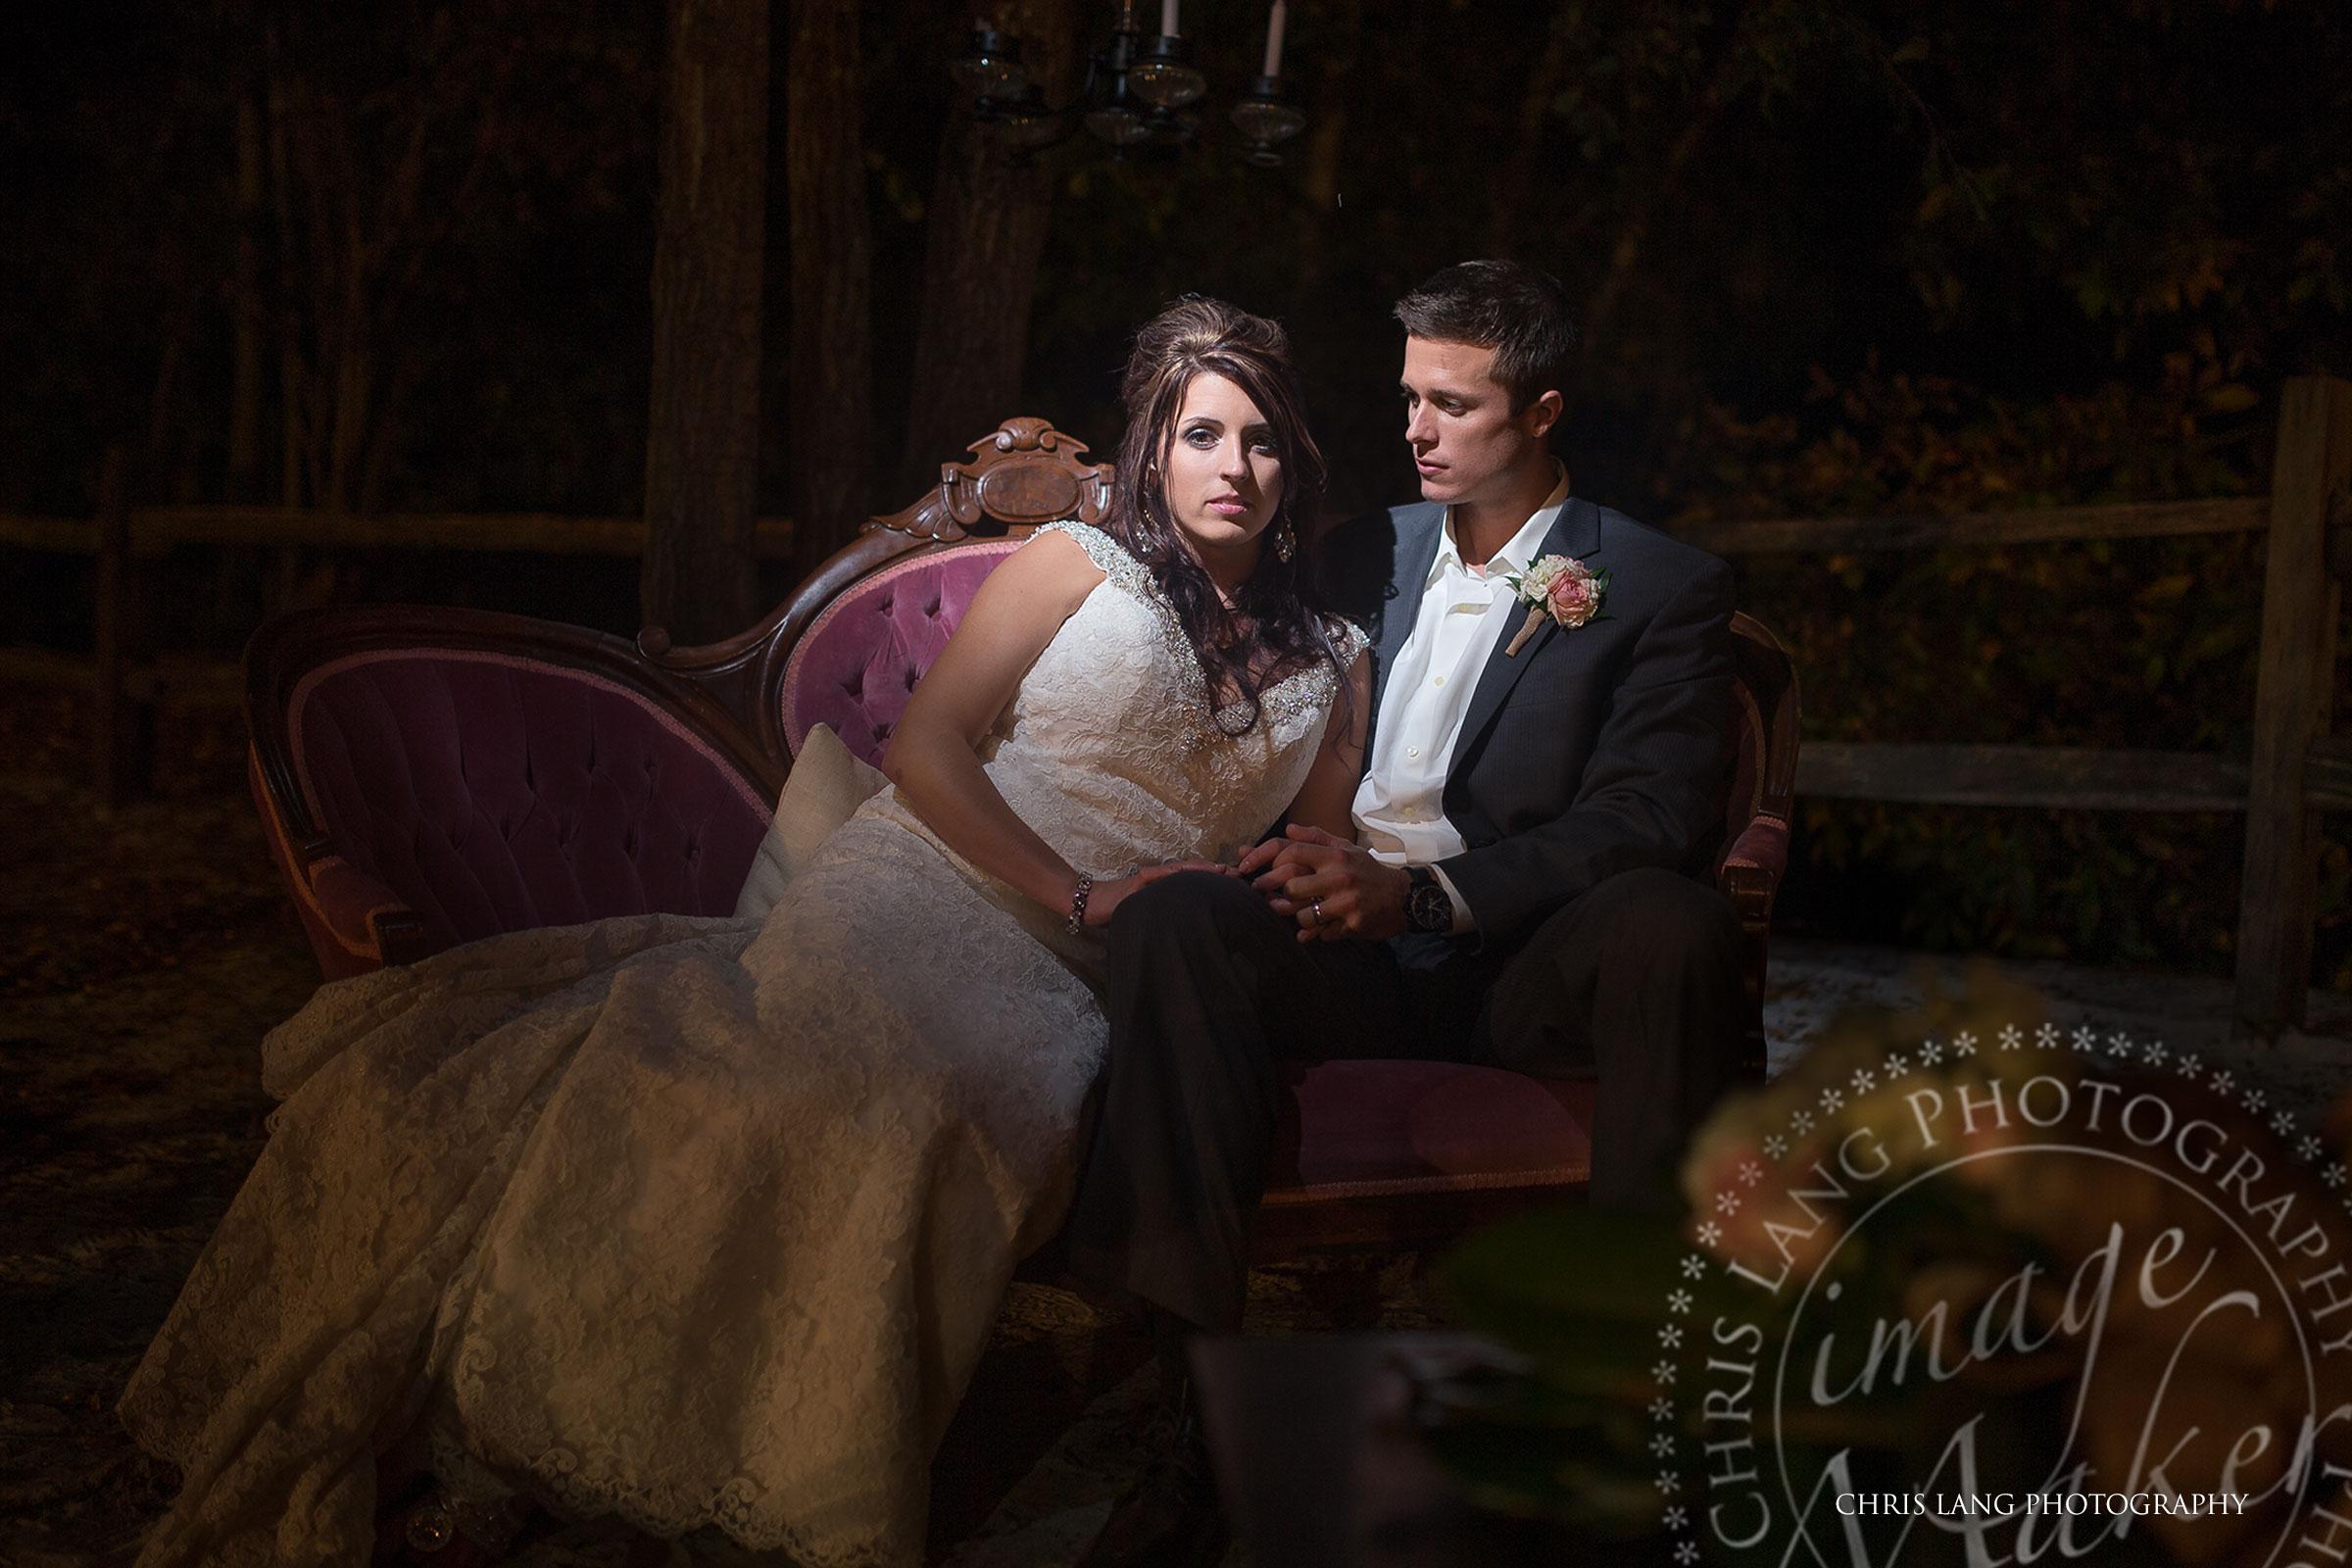 Romantic Nigh Ttime Wedding Picture Of Bride Groom Sitting